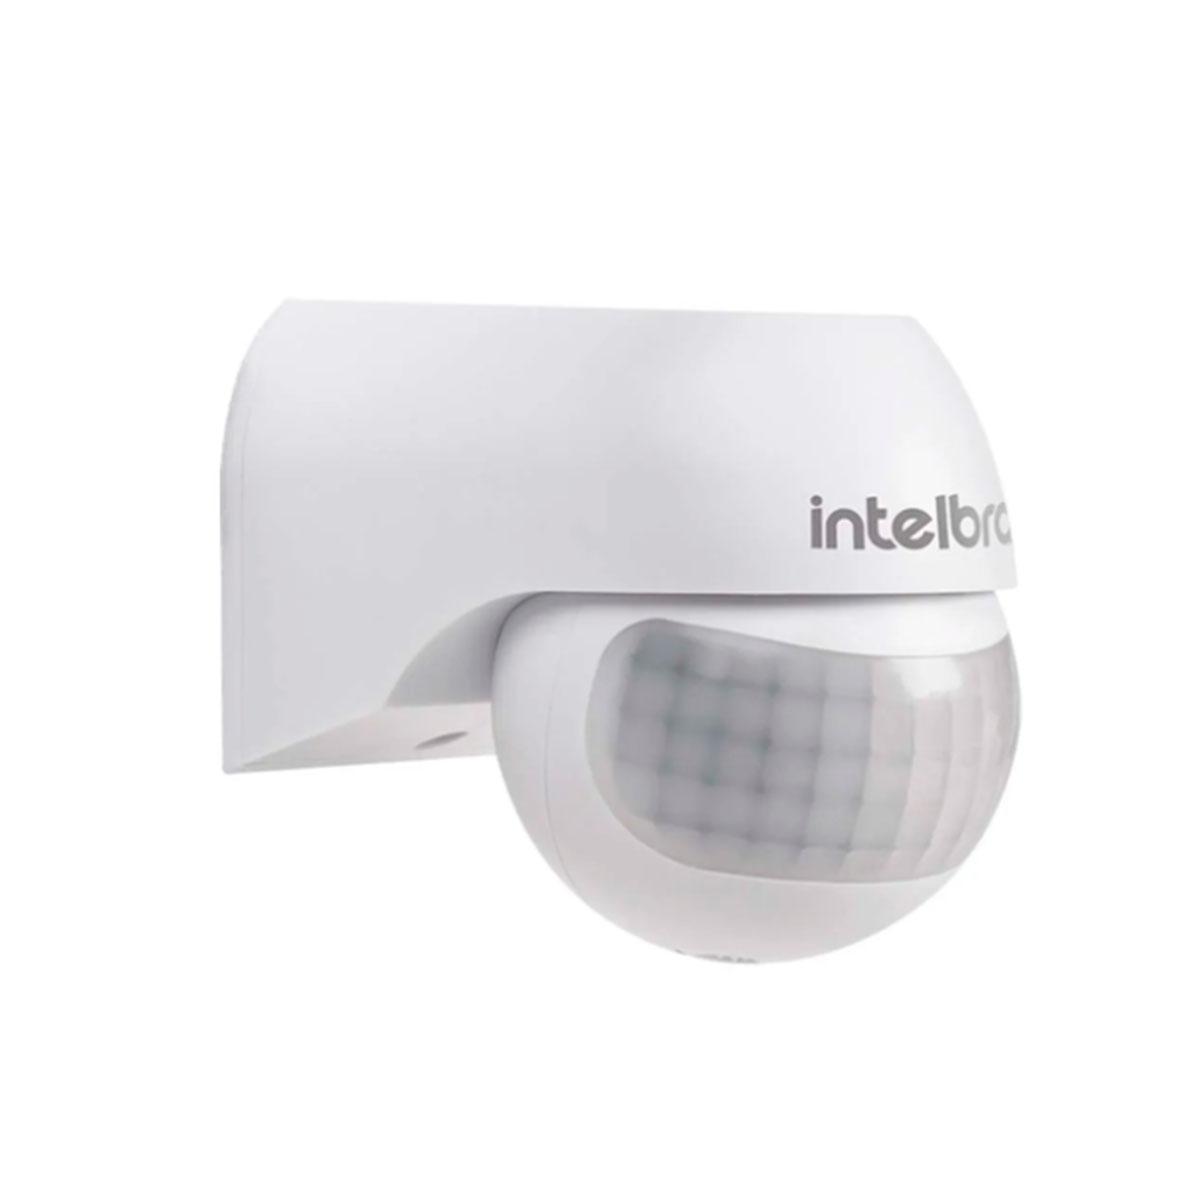 Kit 06 Sensor De Presença Intelbras Para Iluminação Esp 180